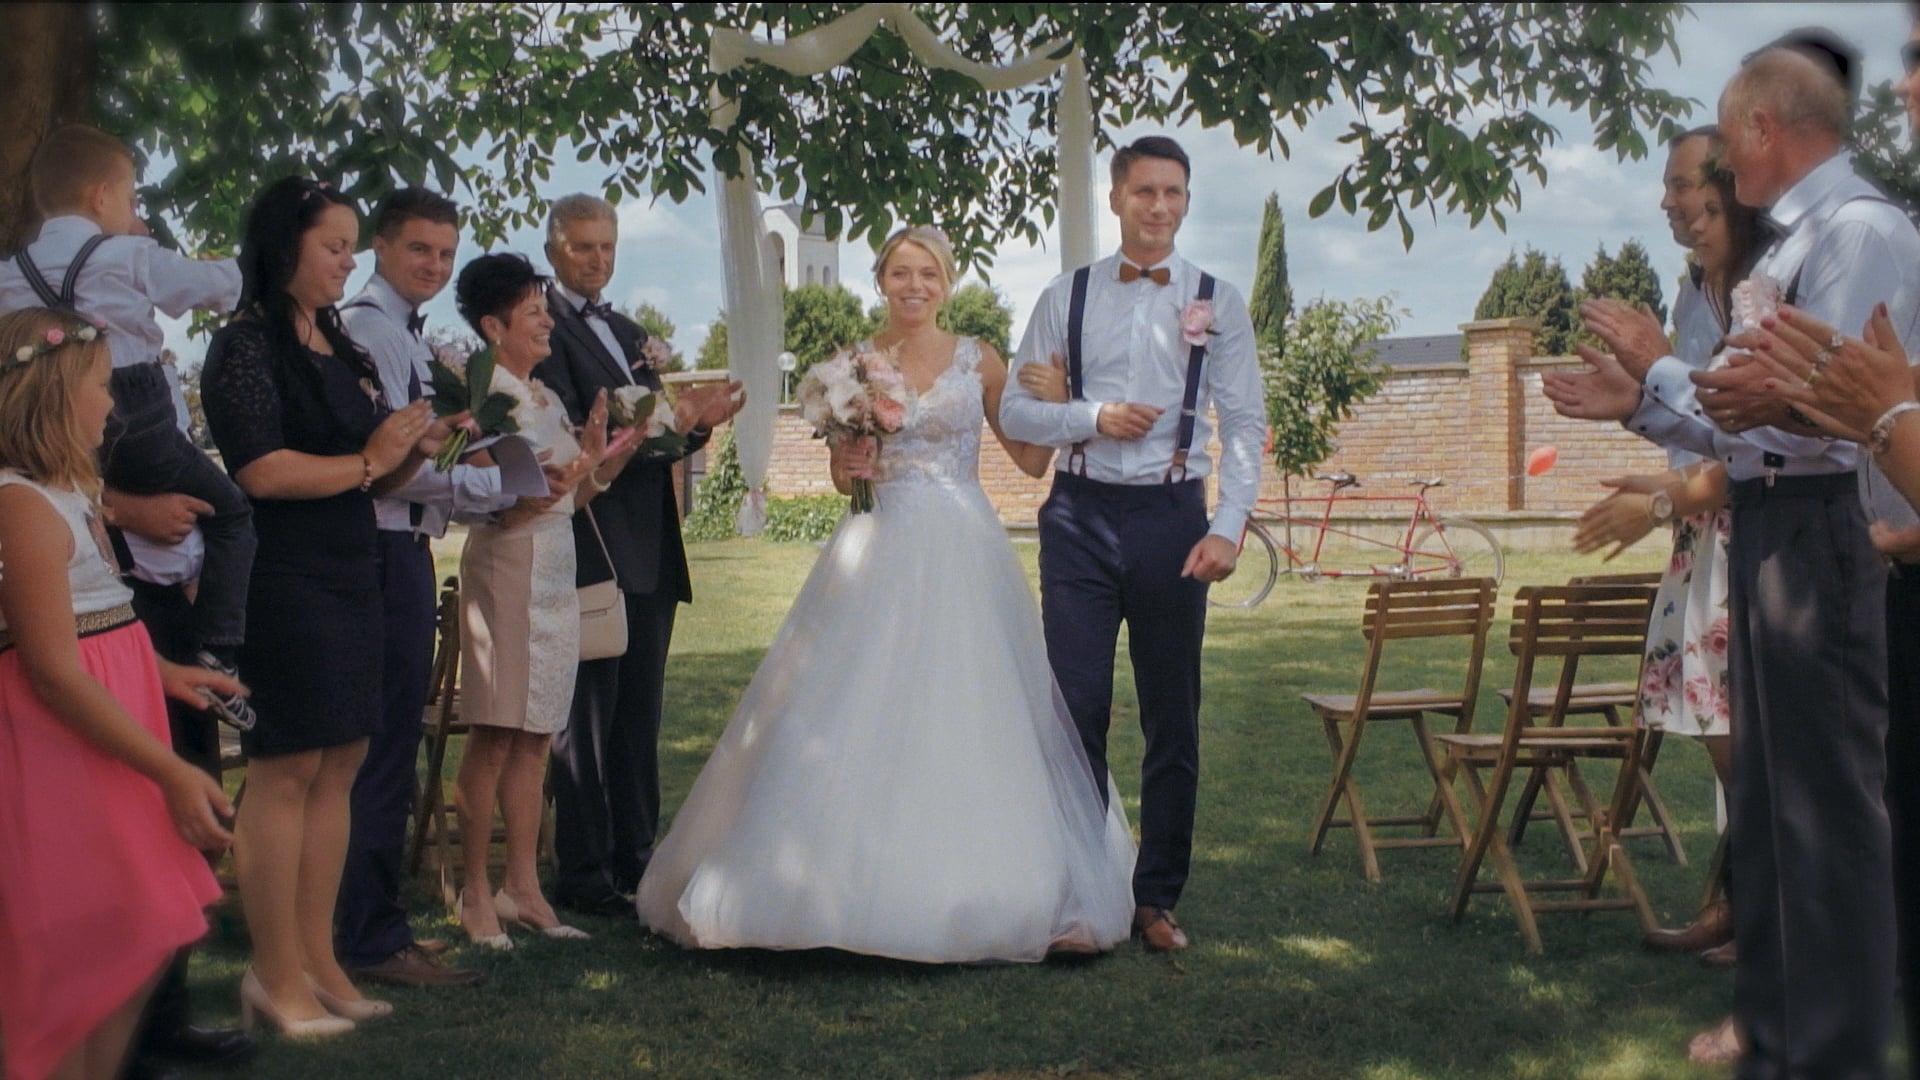 Bára + Honza | Wedding